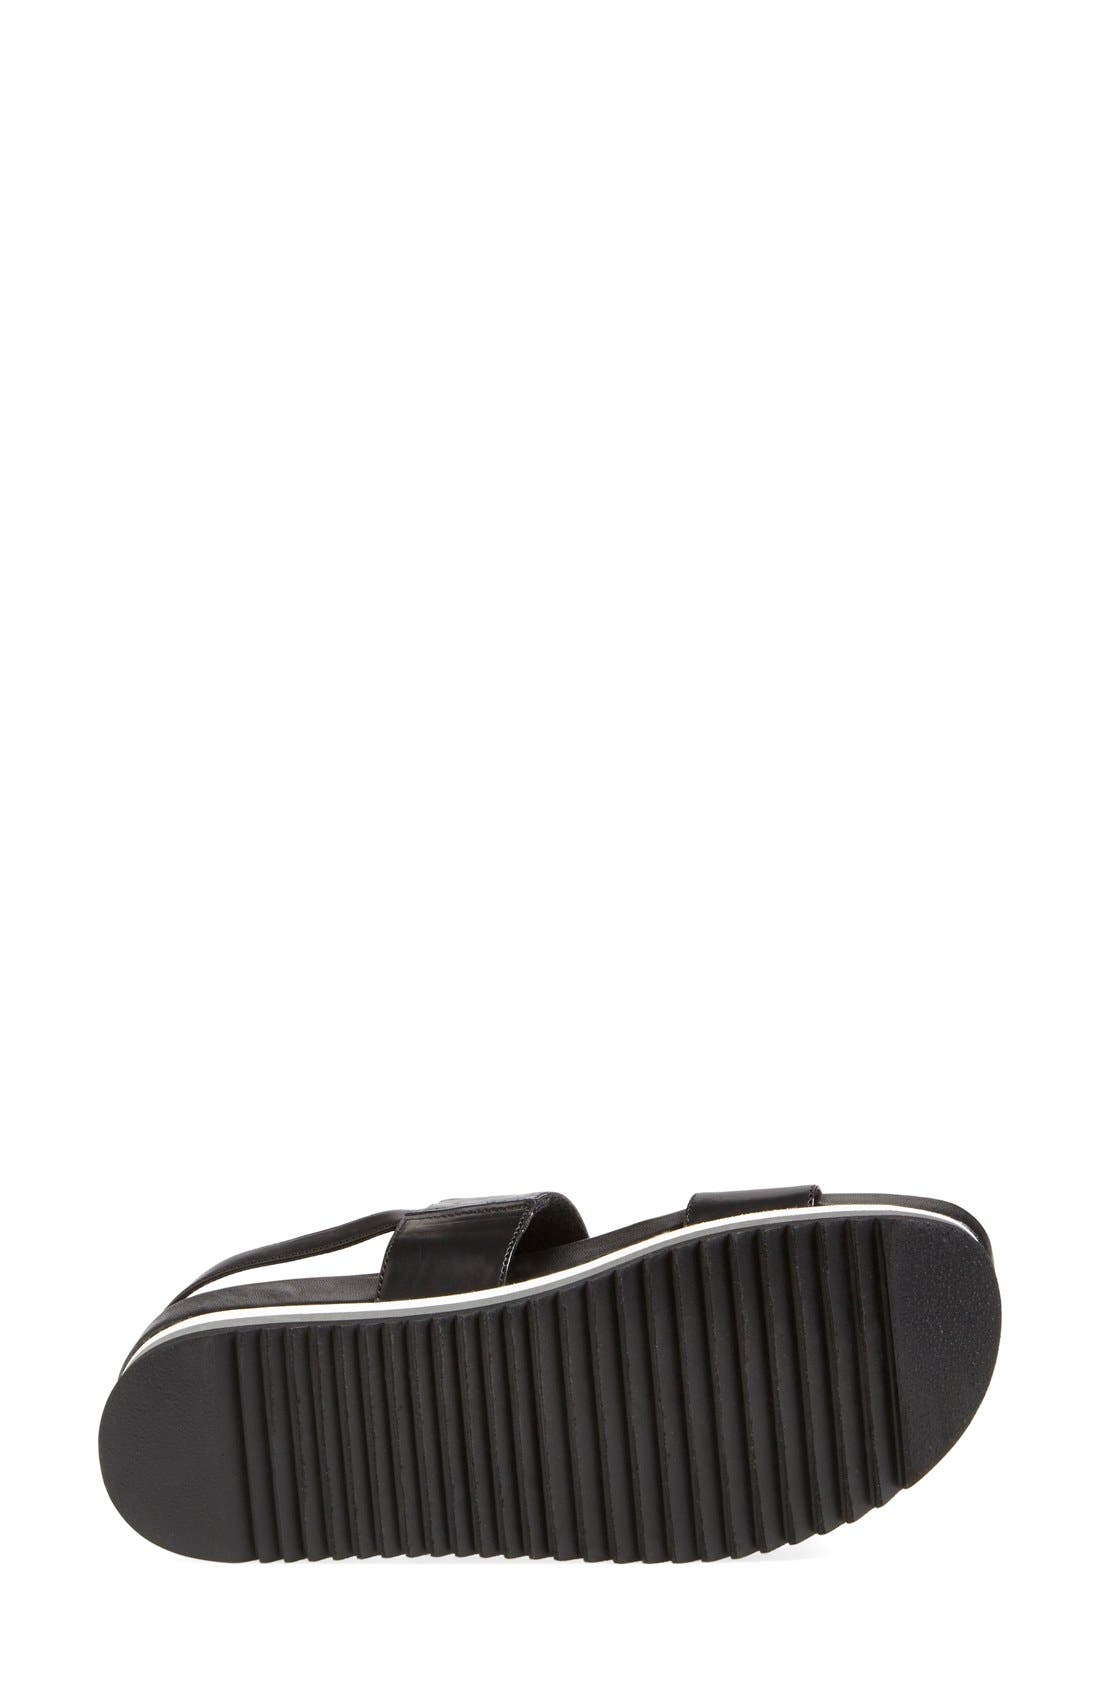 Alternate Image 2  - Anyi Lu 'Viva' Leather Platform Sandal (Women)